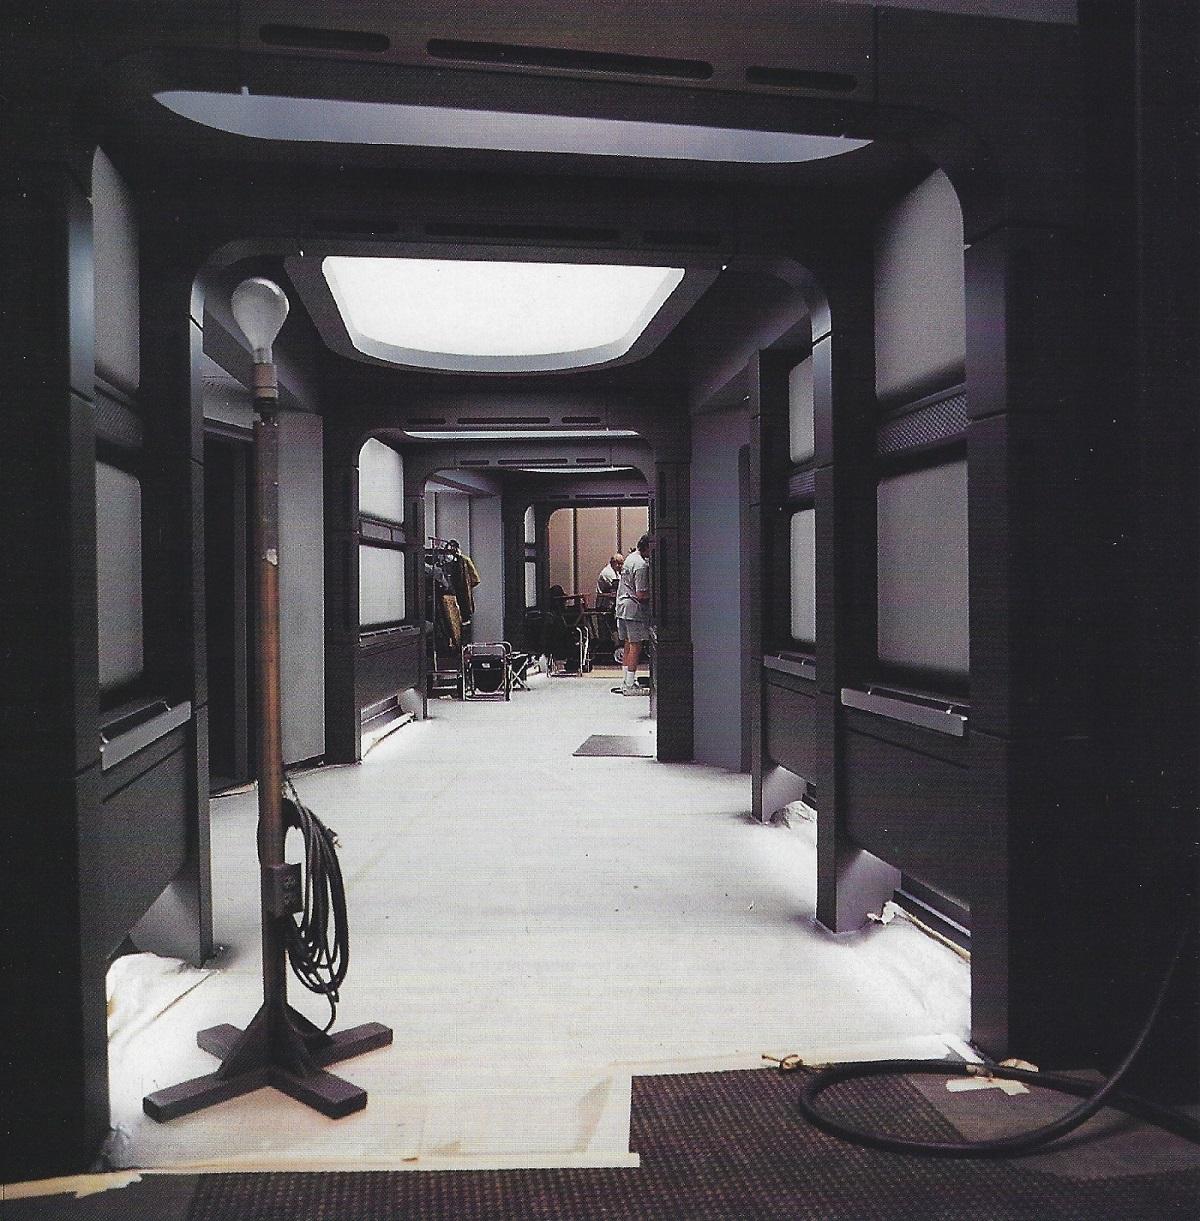 Intrepid class corridor (set).jpg